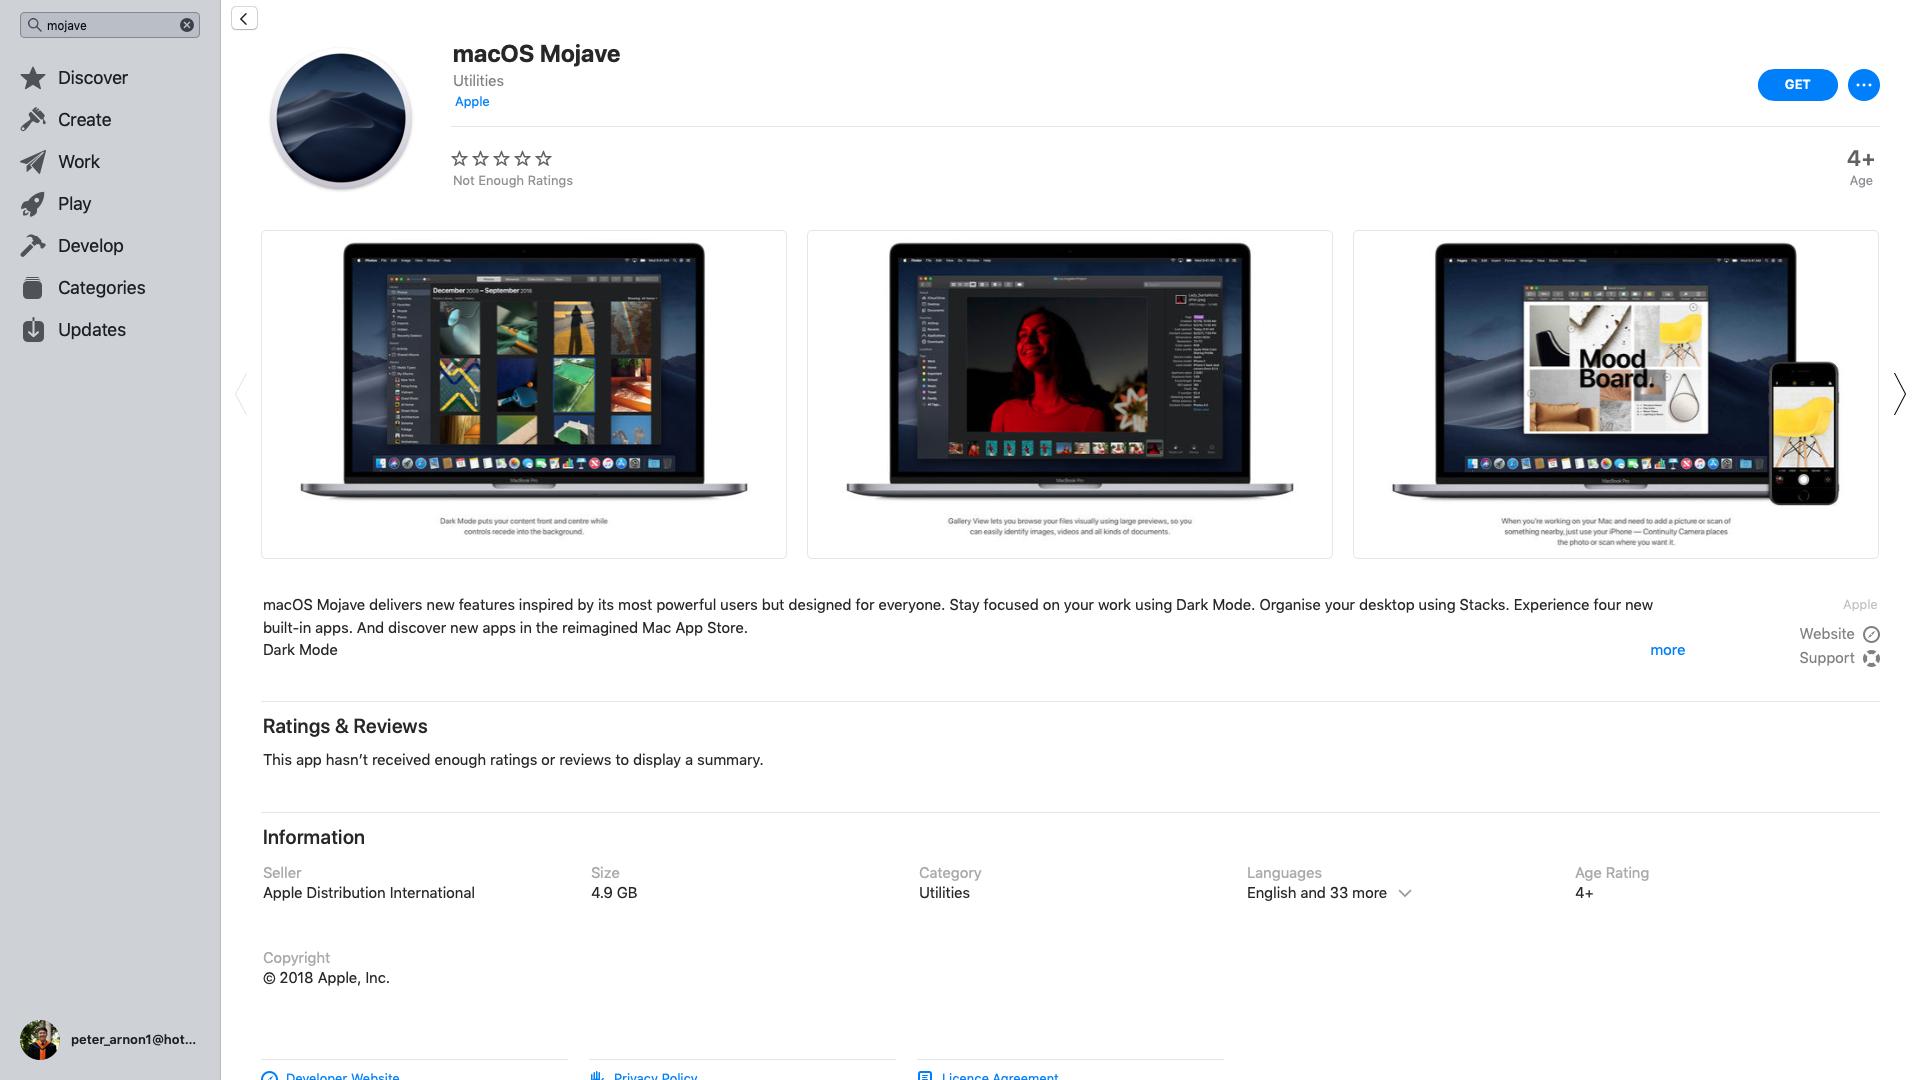 macOS Mojave App Store